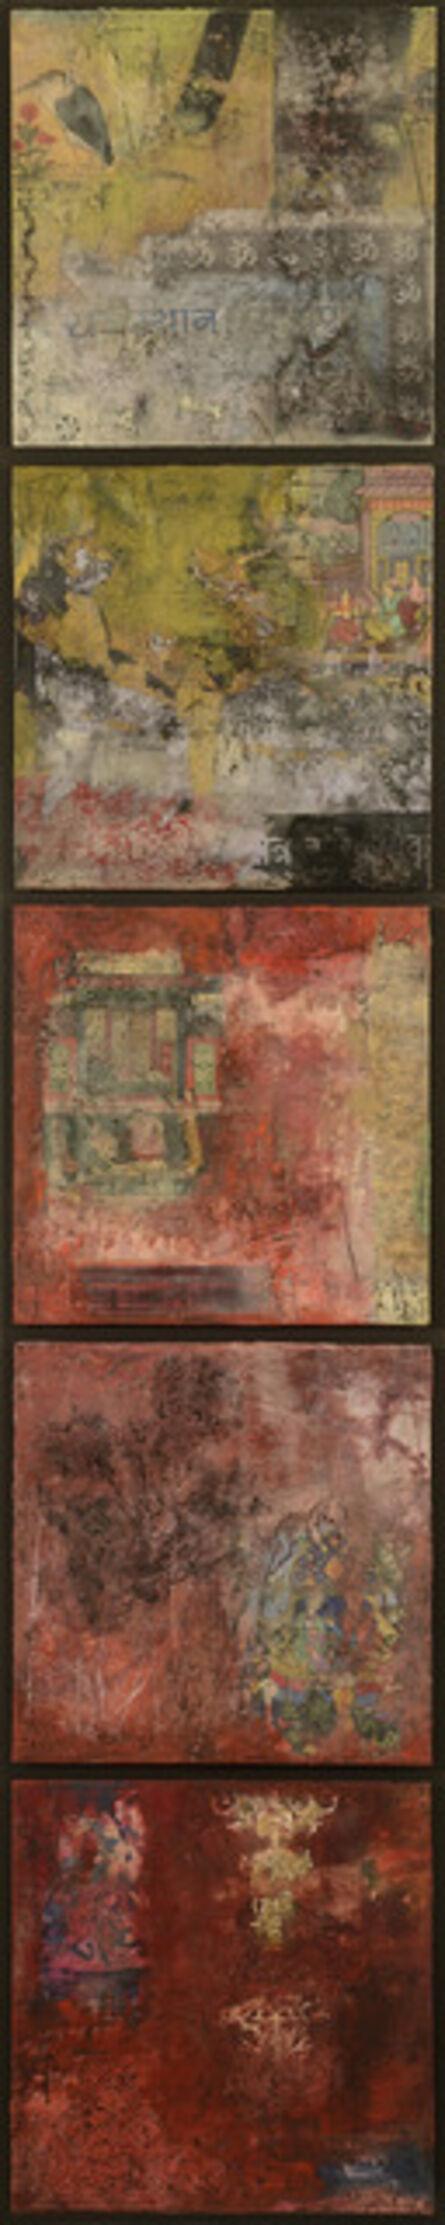 Claudia Marseille, 'Impressions of Rajasthan', 2013